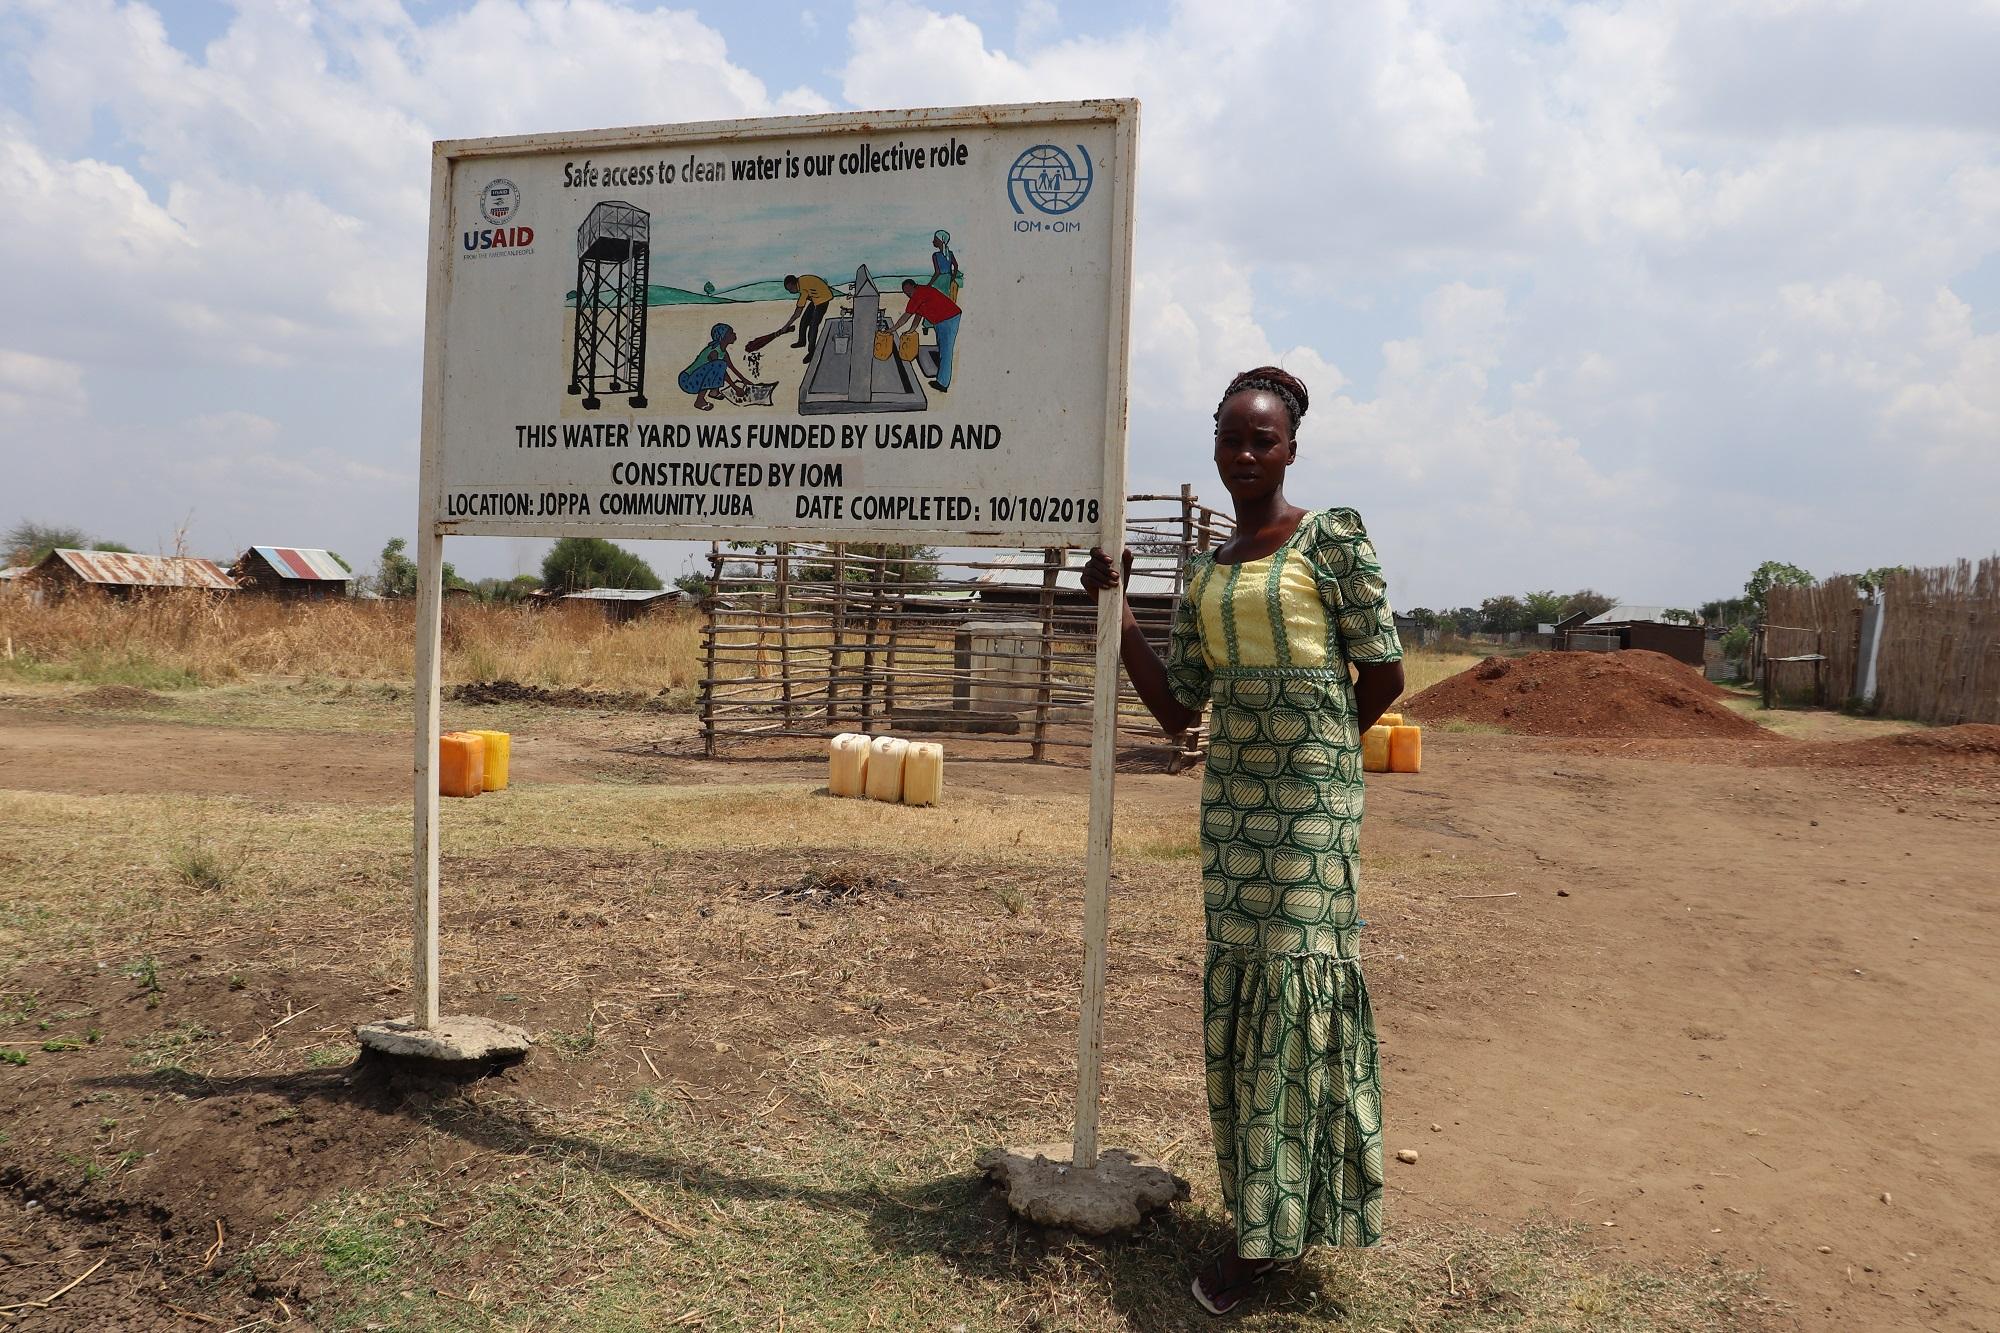 The Borehole Handpump Mechanic Breaking Stereotypes in Her Community 4